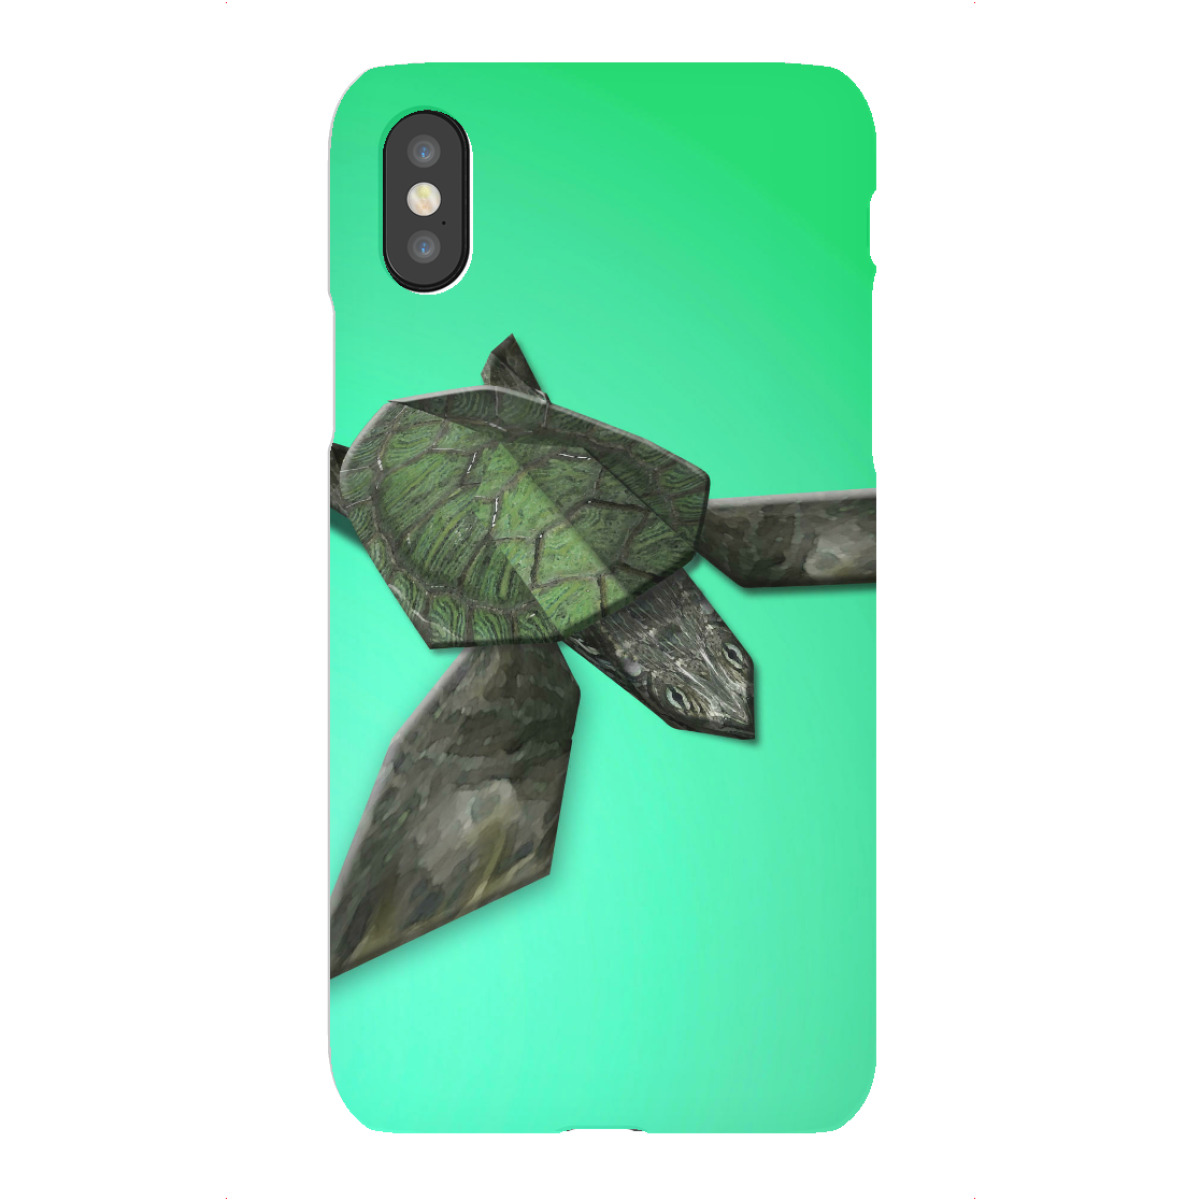 hülle iphone 6 schildkröte